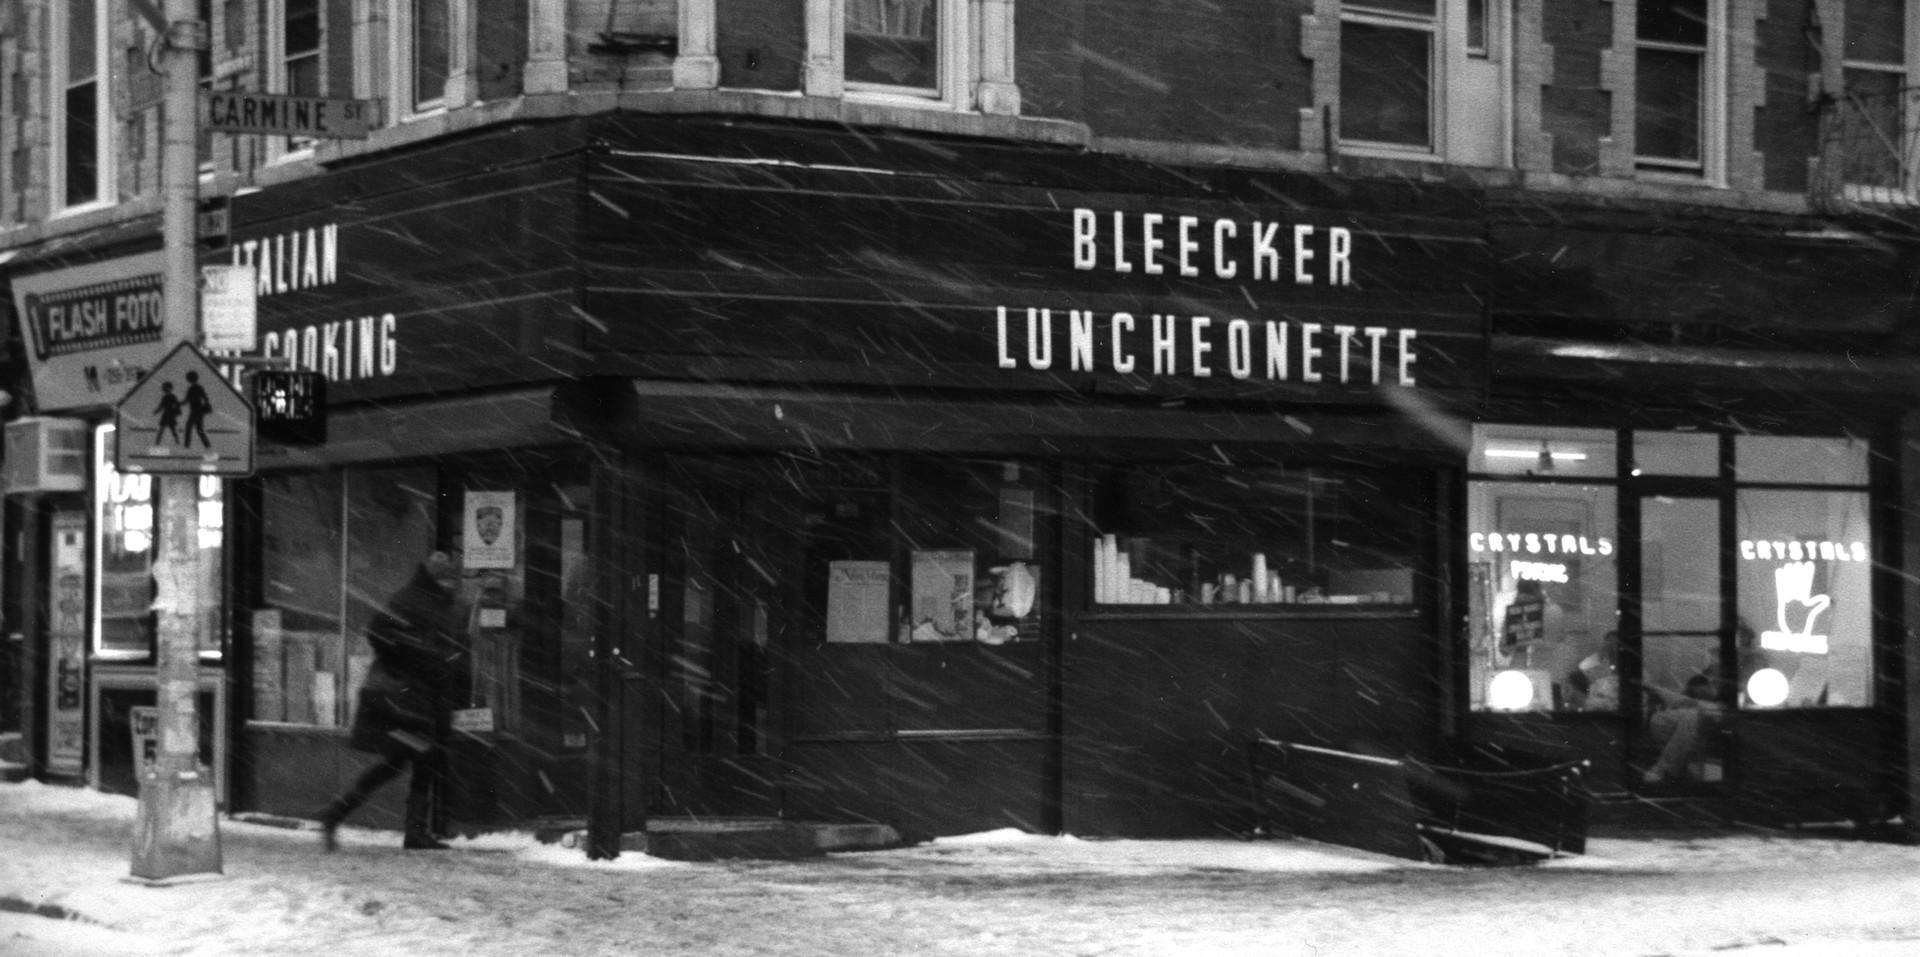 Bleeker Luncheonette, 1990